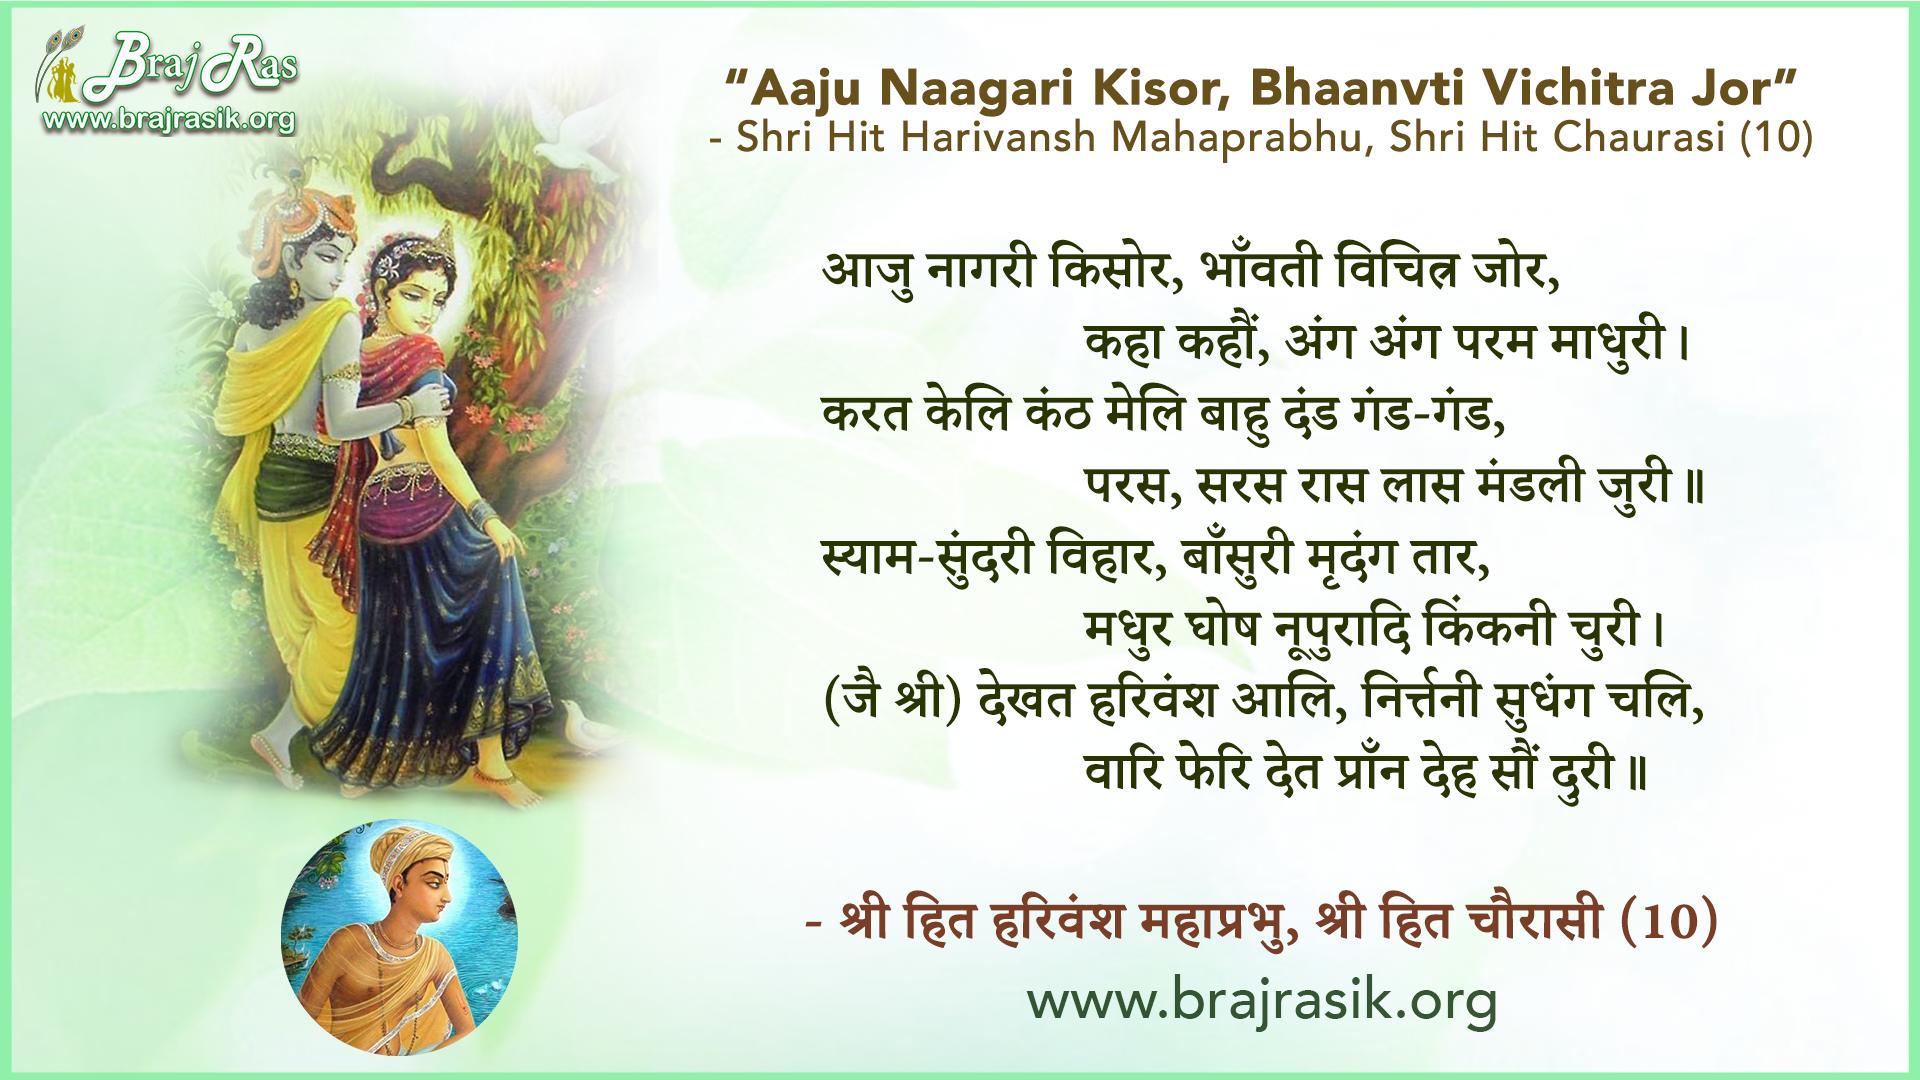 Aaju Naagari Kisor, Bhaanvti Vichitra Jor - Shri Hit Harivansh Mahaprabhu, Shri Hit Chaurasi (10)